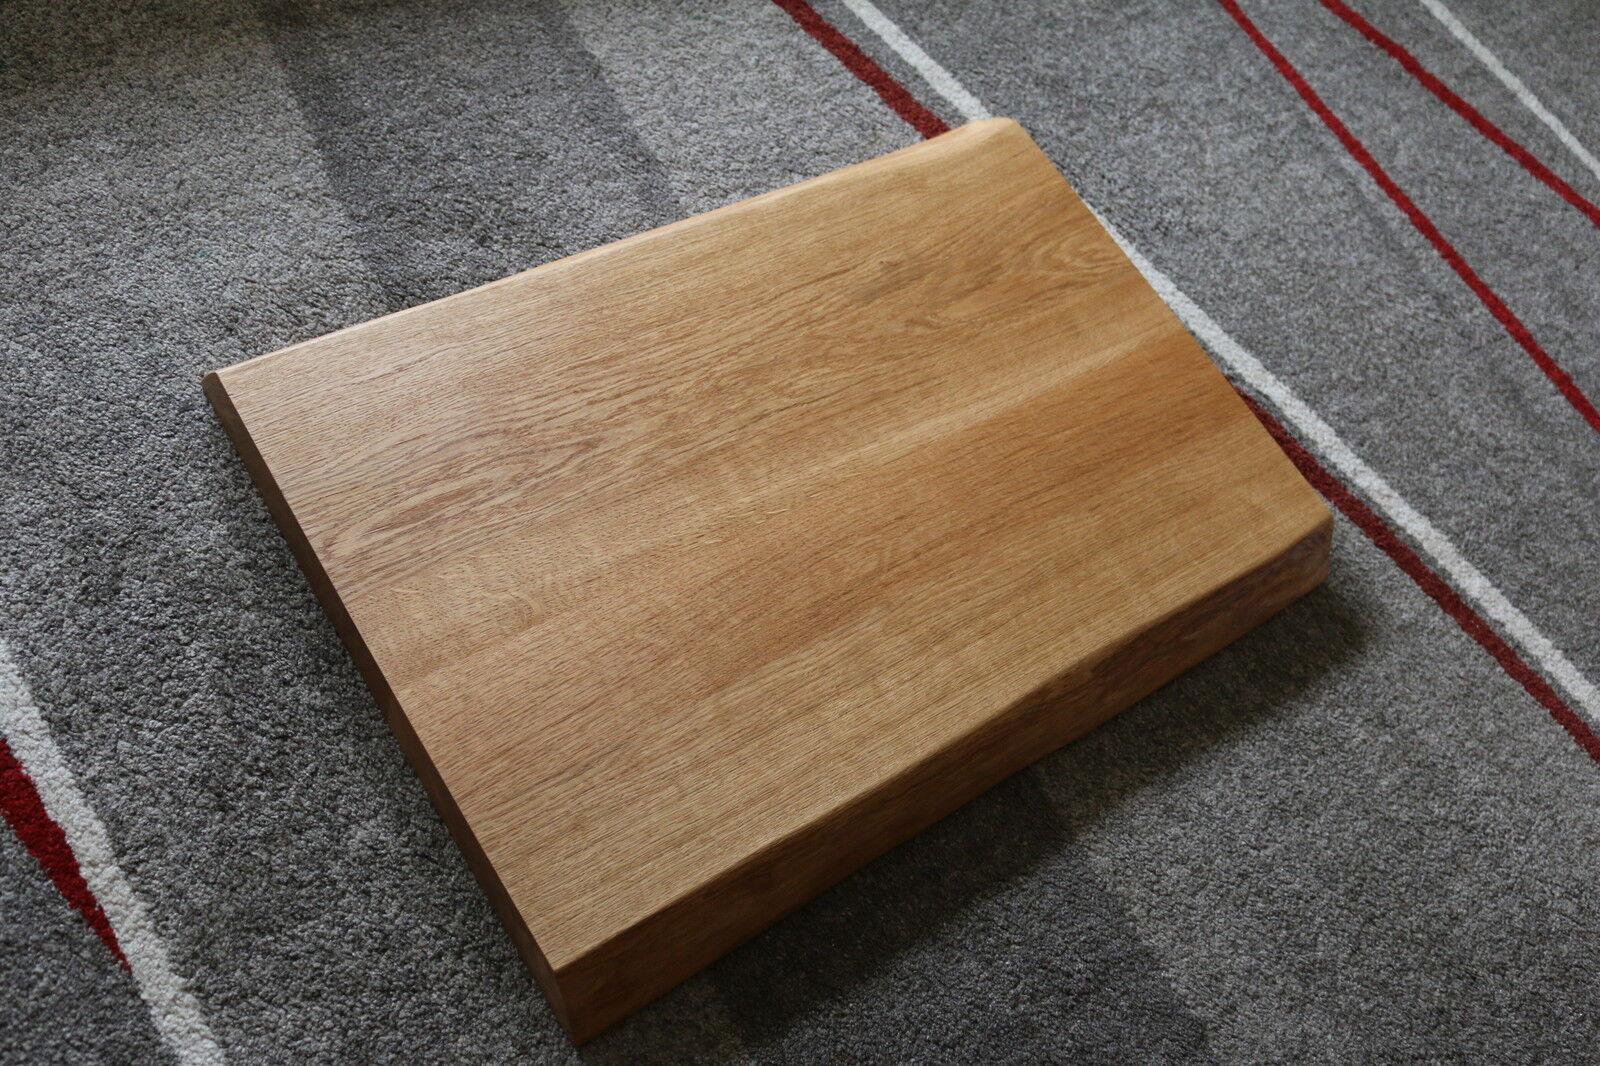 tischplatte platte eiche massiv holz tisch brett leimholz 5 5 cm stark baumkante eur 280 00. Black Bedroom Furniture Sets. Home Design Ideas